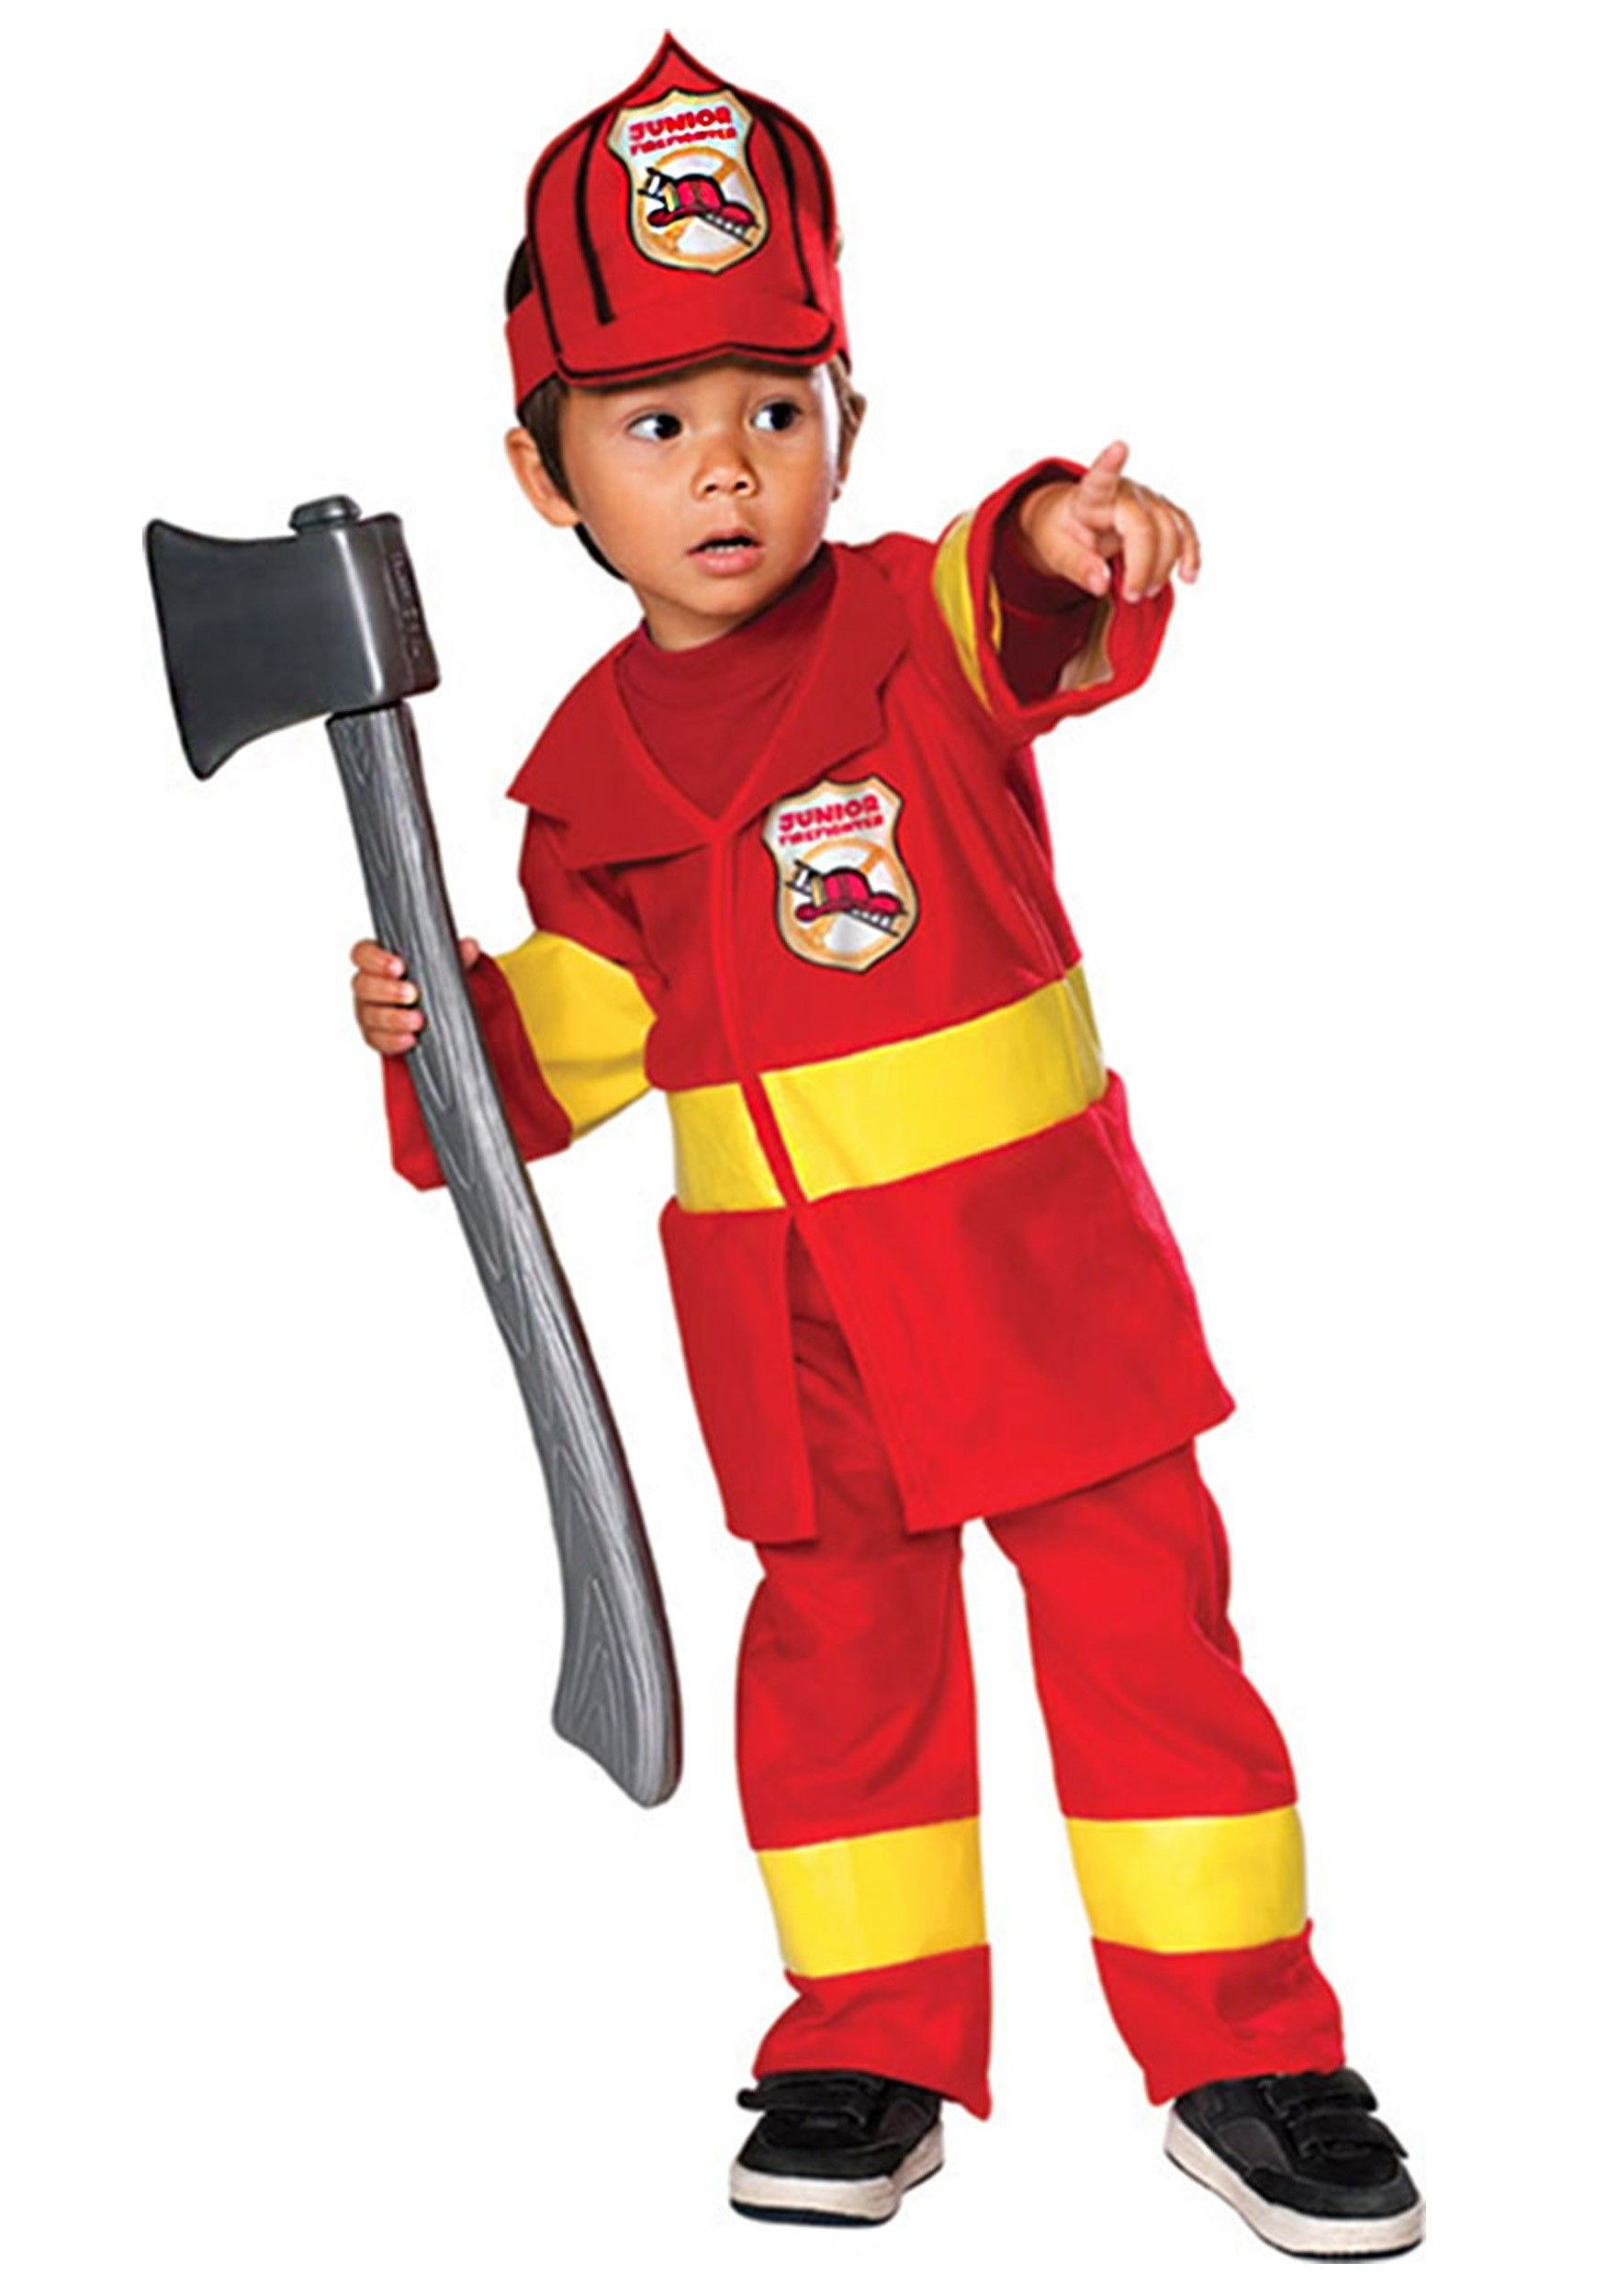 44765e2d5ab881 Fantasia Infantil Bombeiro Meninos Halloween Carnaval   moldes ...